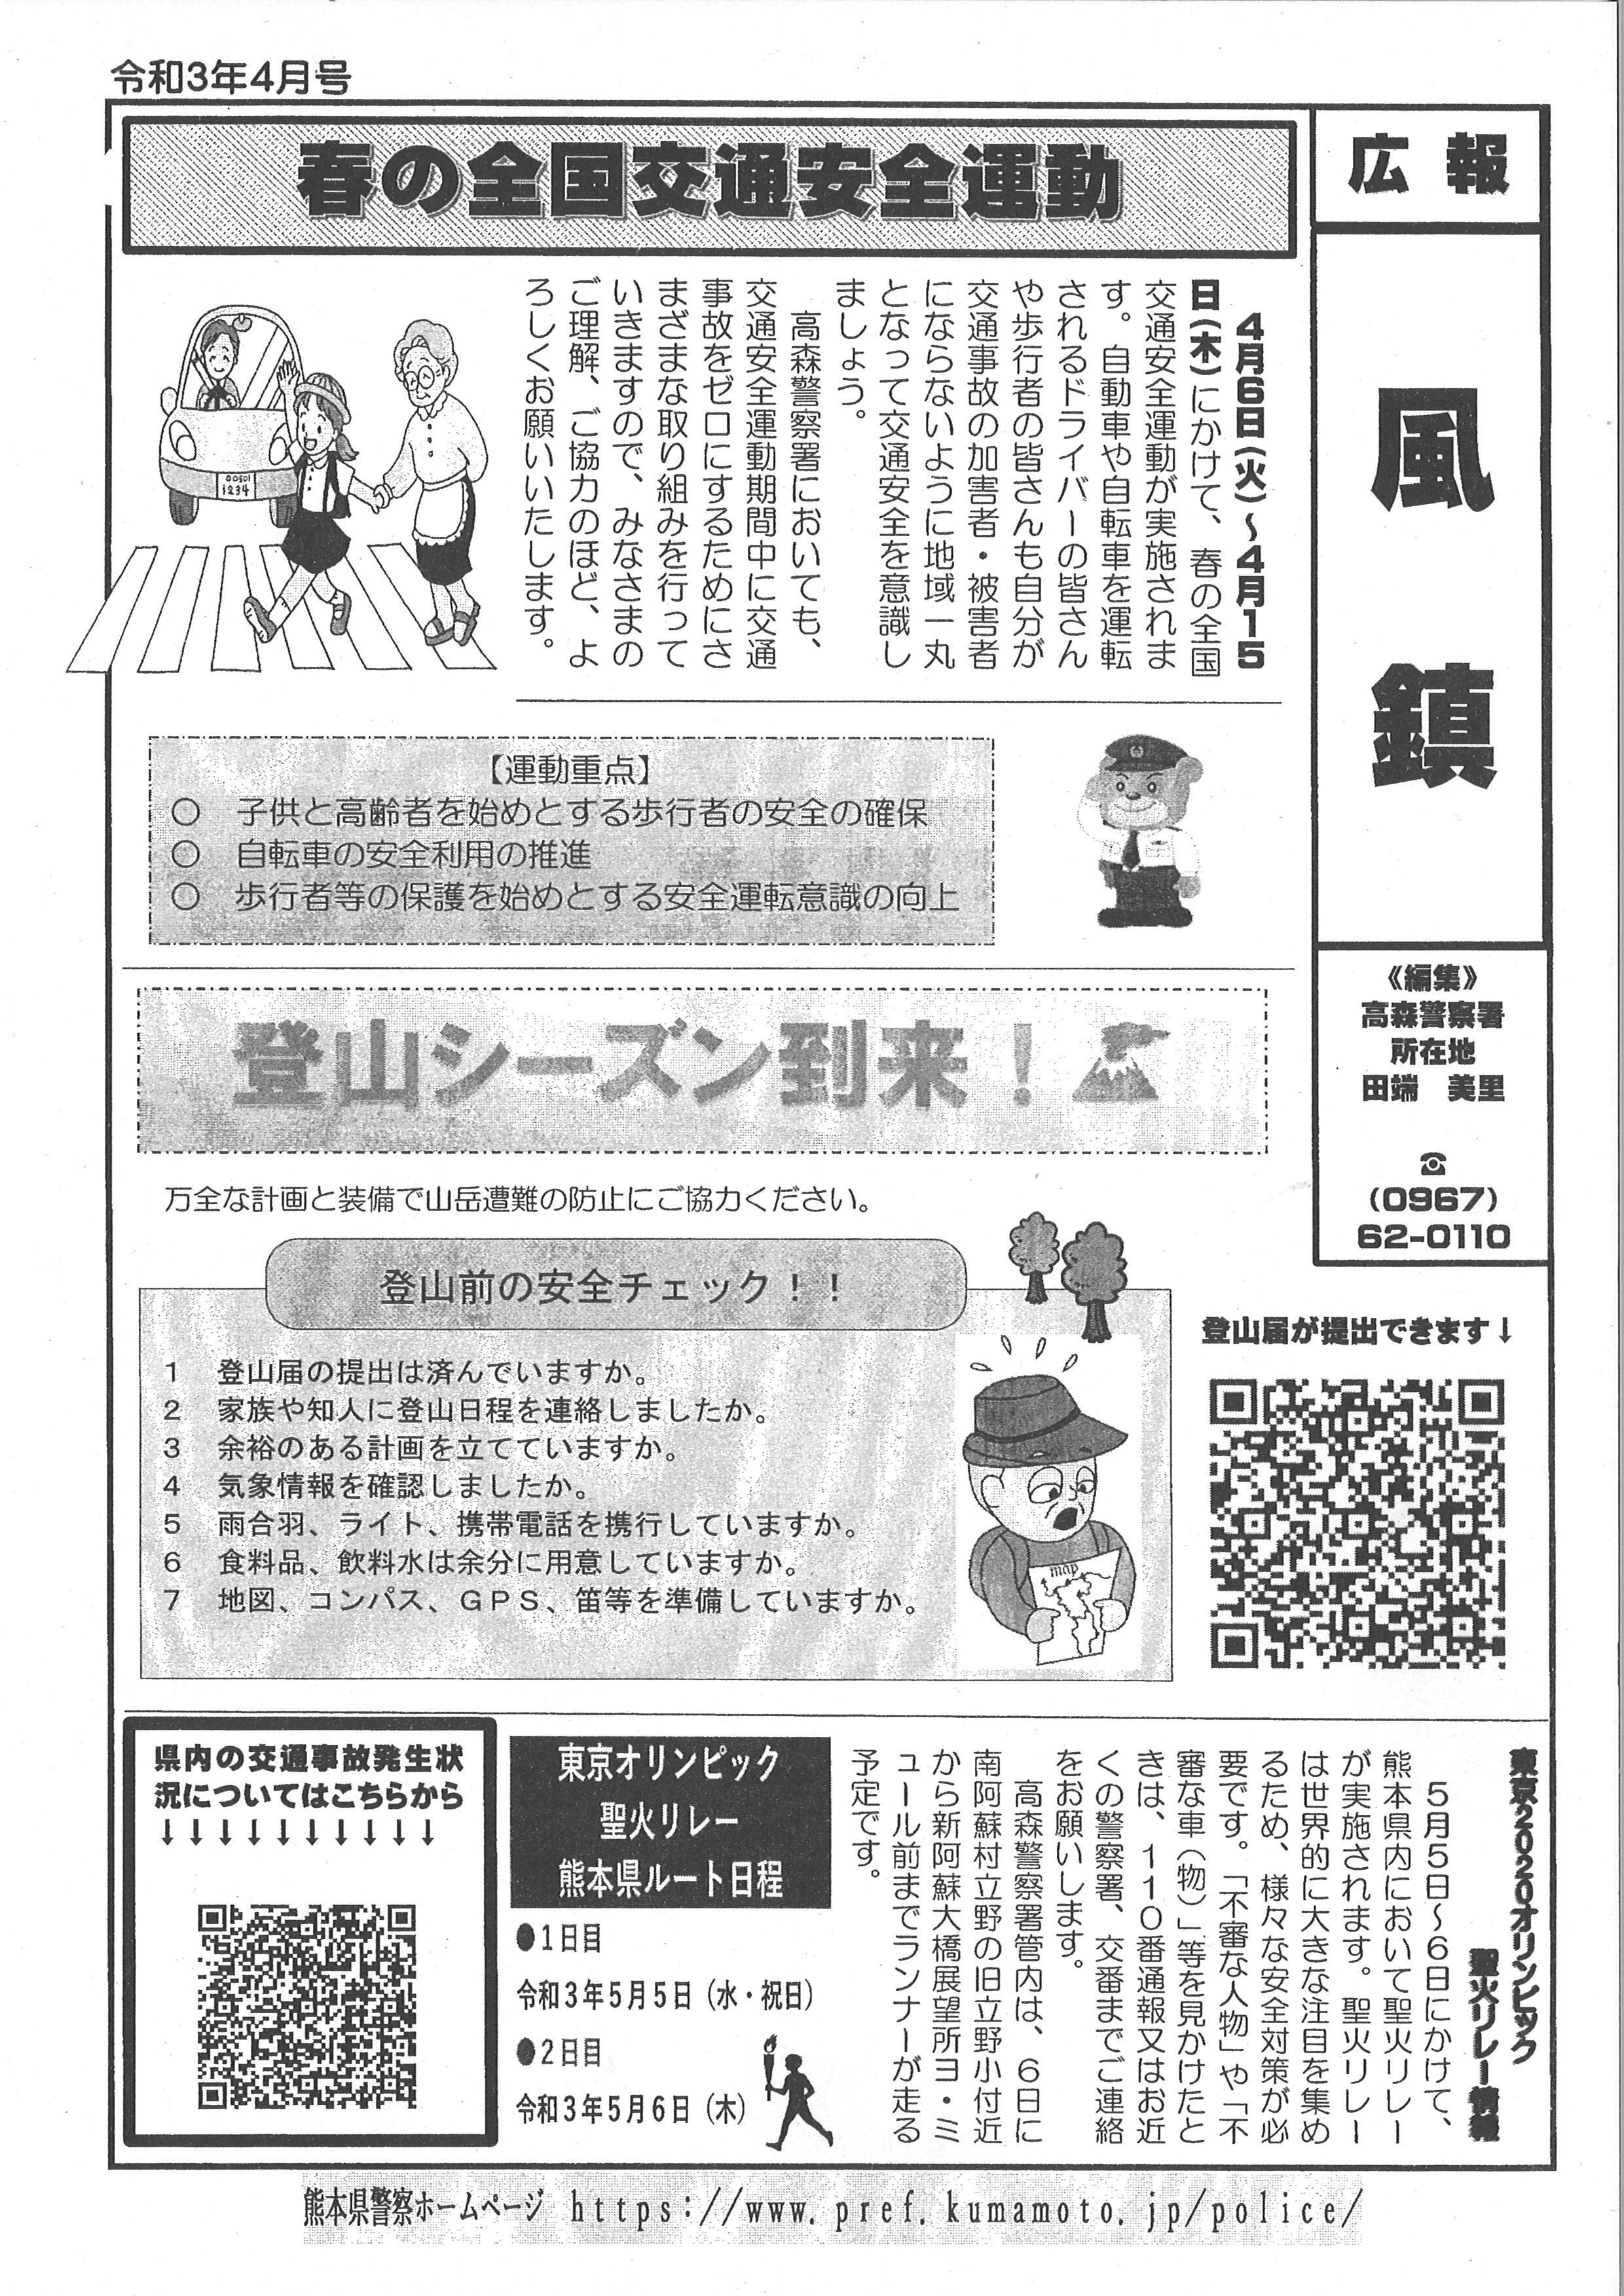 http://www.town.takamori.kumamoto.jp/chosha/somu/upload/25a0644b1625b1bfeea1254af27fb60cdc2919a4.jpg